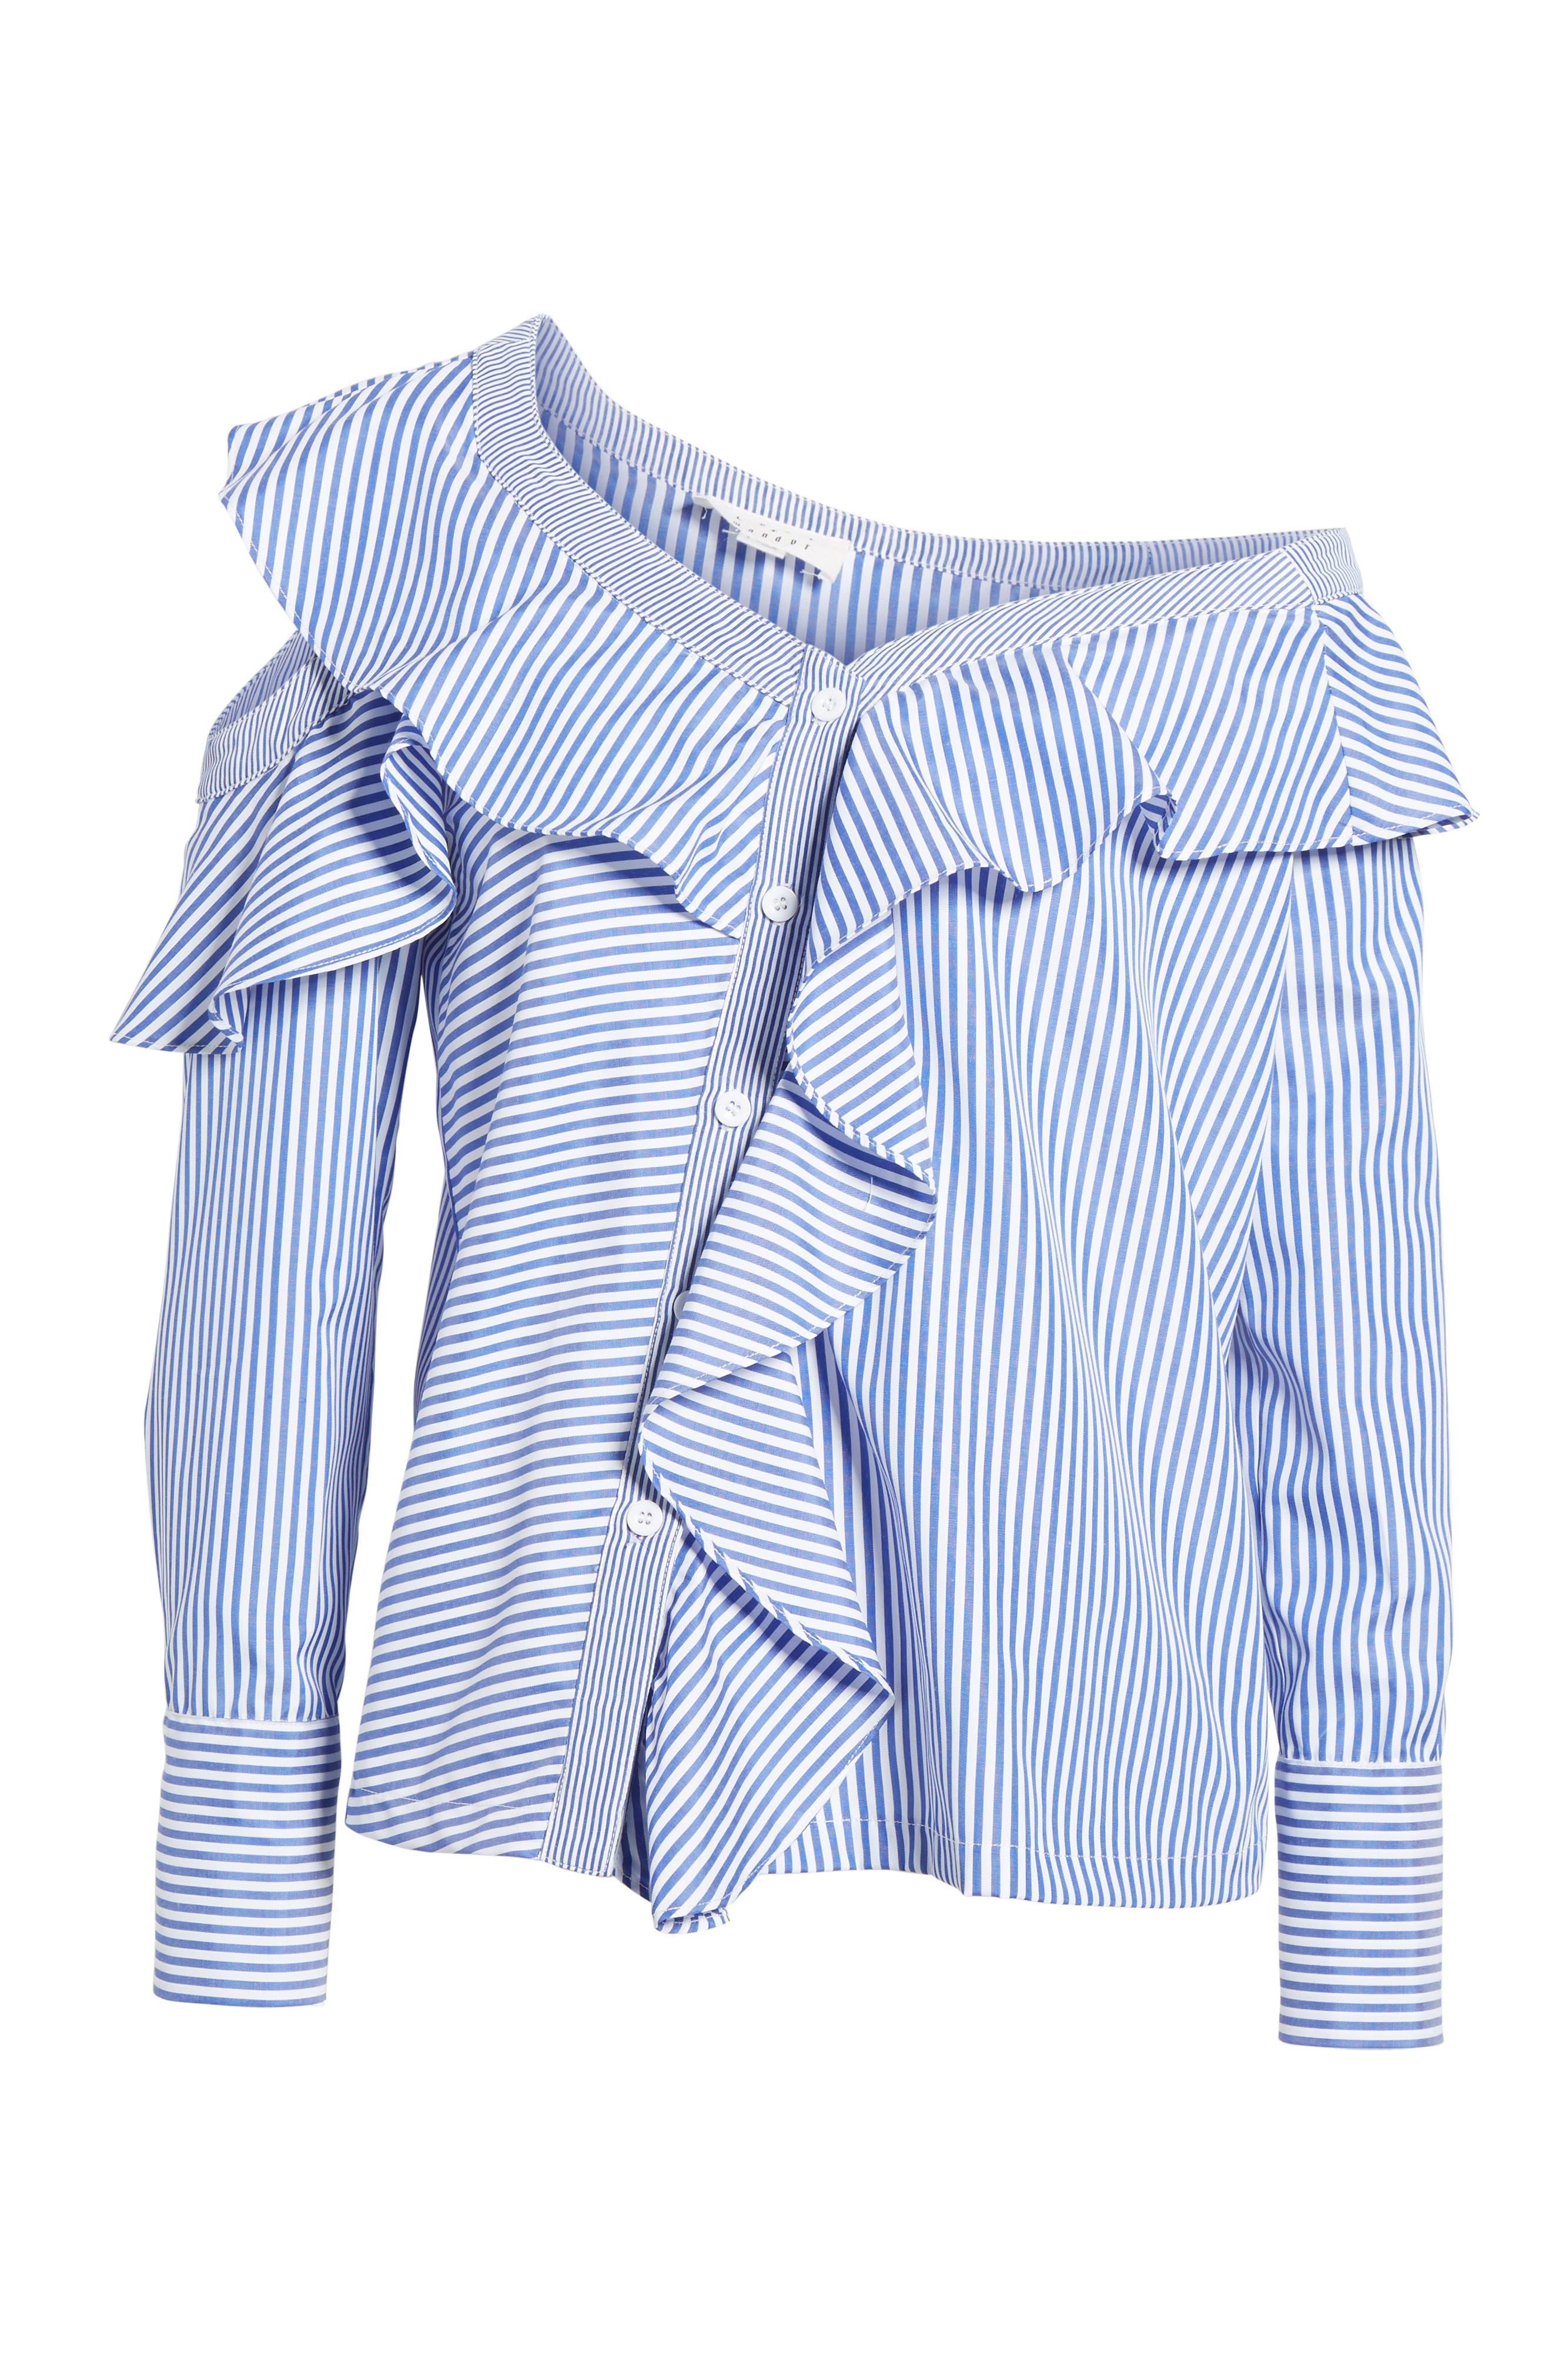 Asymmetrical Open Shoulder Ruffle Top,                             Alternate thumbnail 6, color,                             Blue/ White Stripe